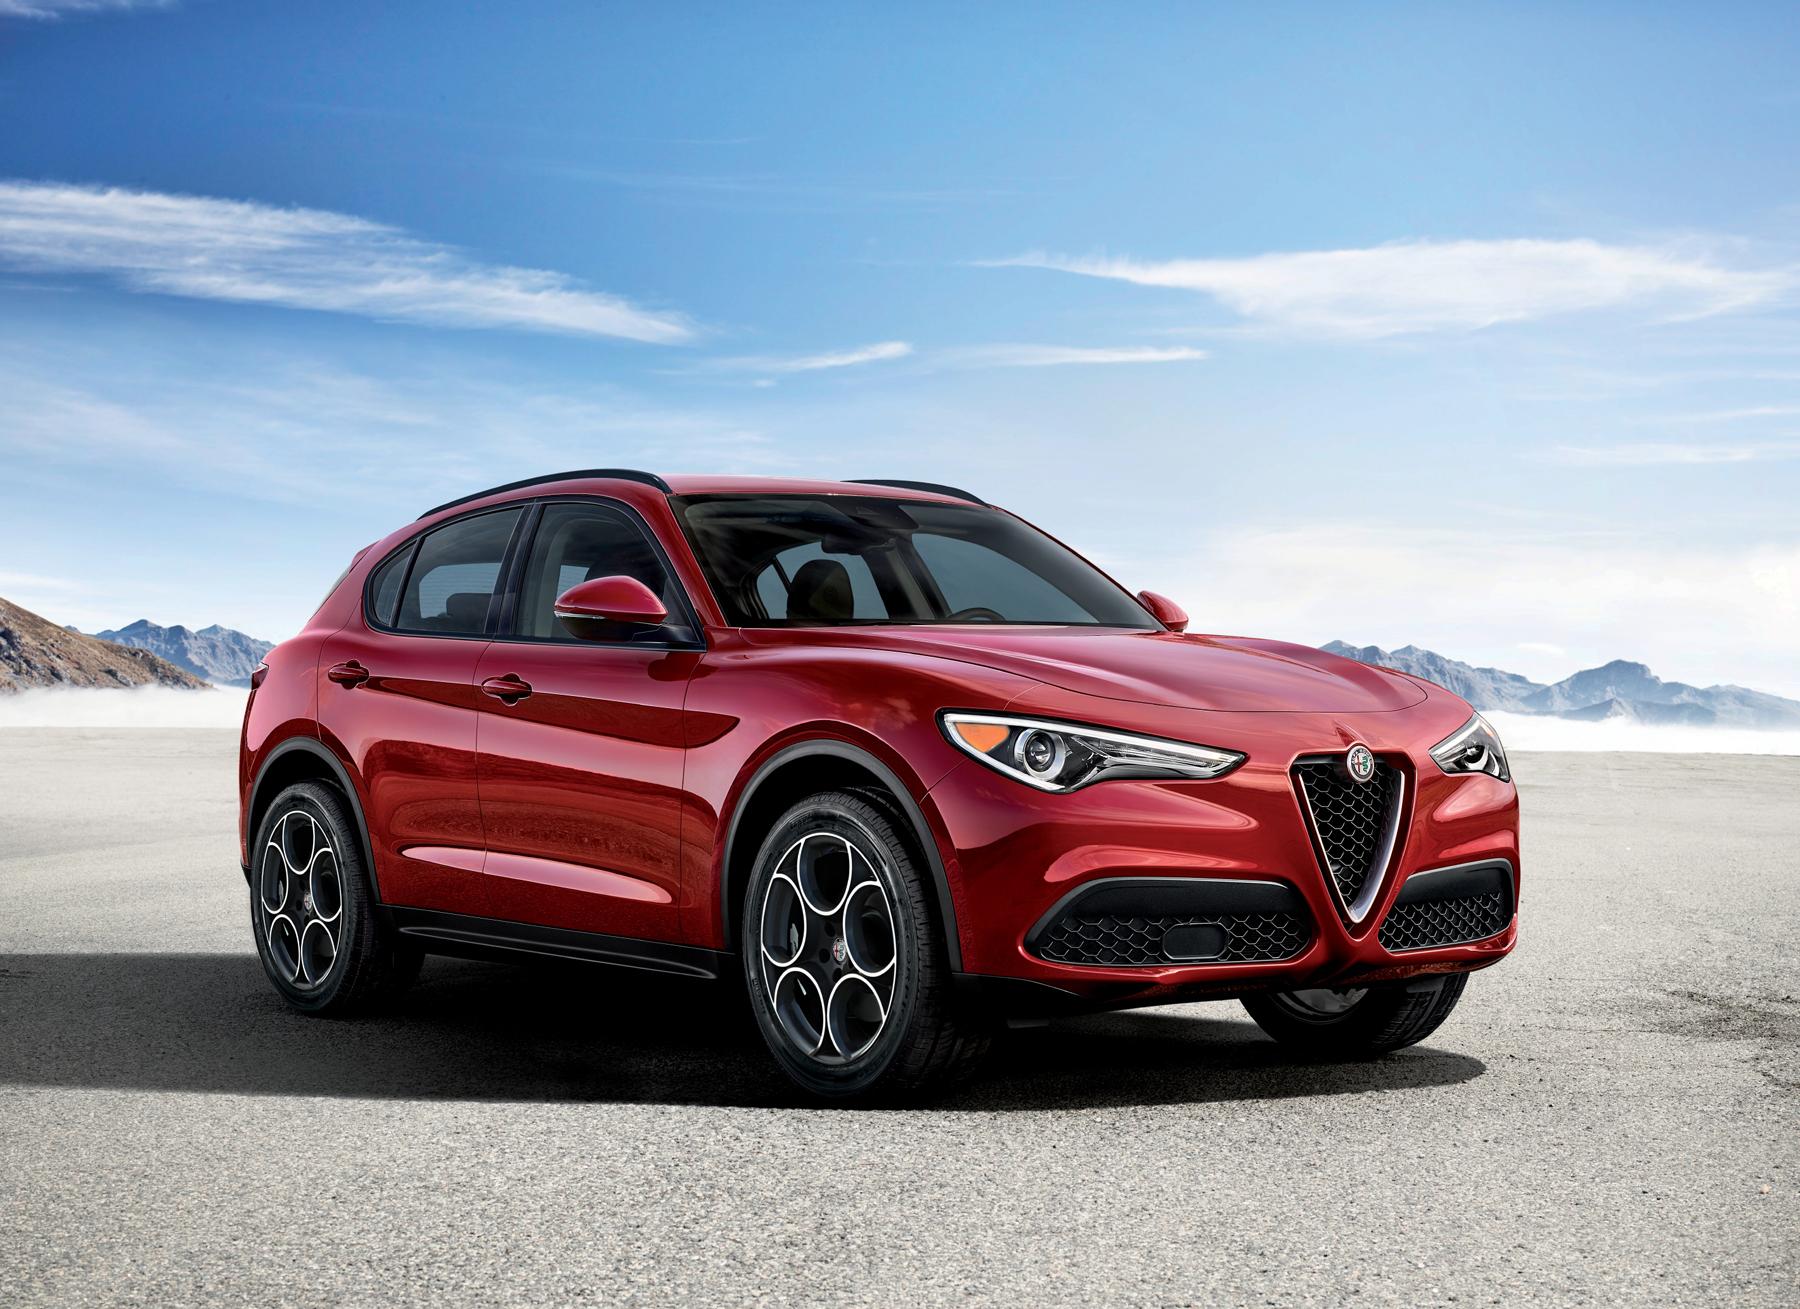 Stelvio Enters The Premium Suv Segment Italian Style Wheels Ca